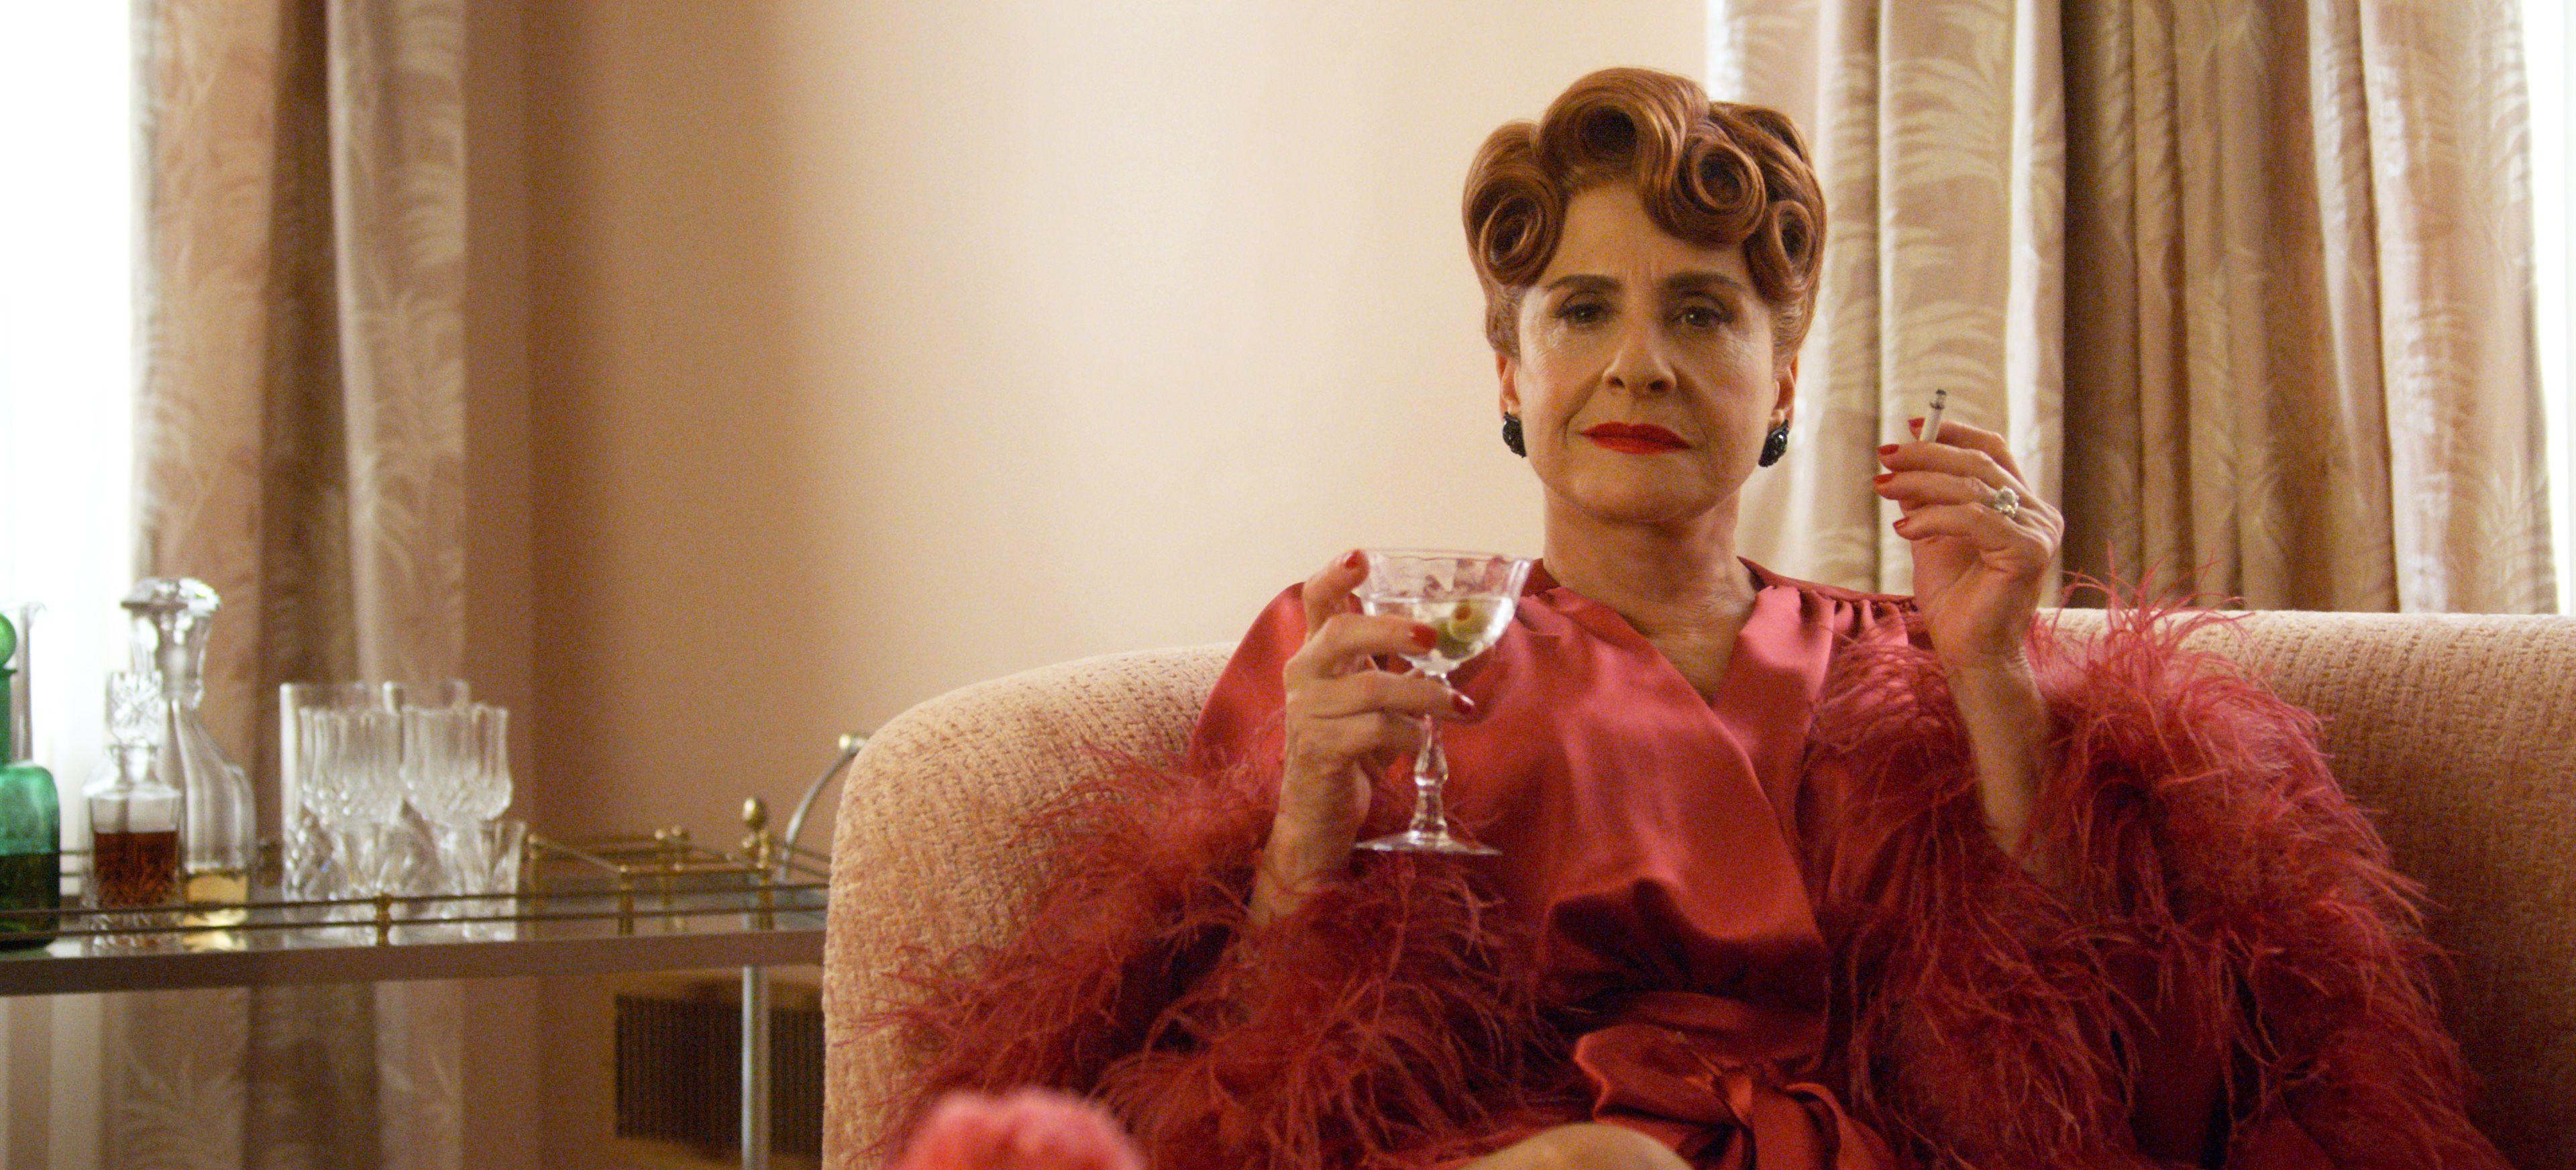 Stüdyo şefi 'Avis Amberg' rolundeki Patti LuPone